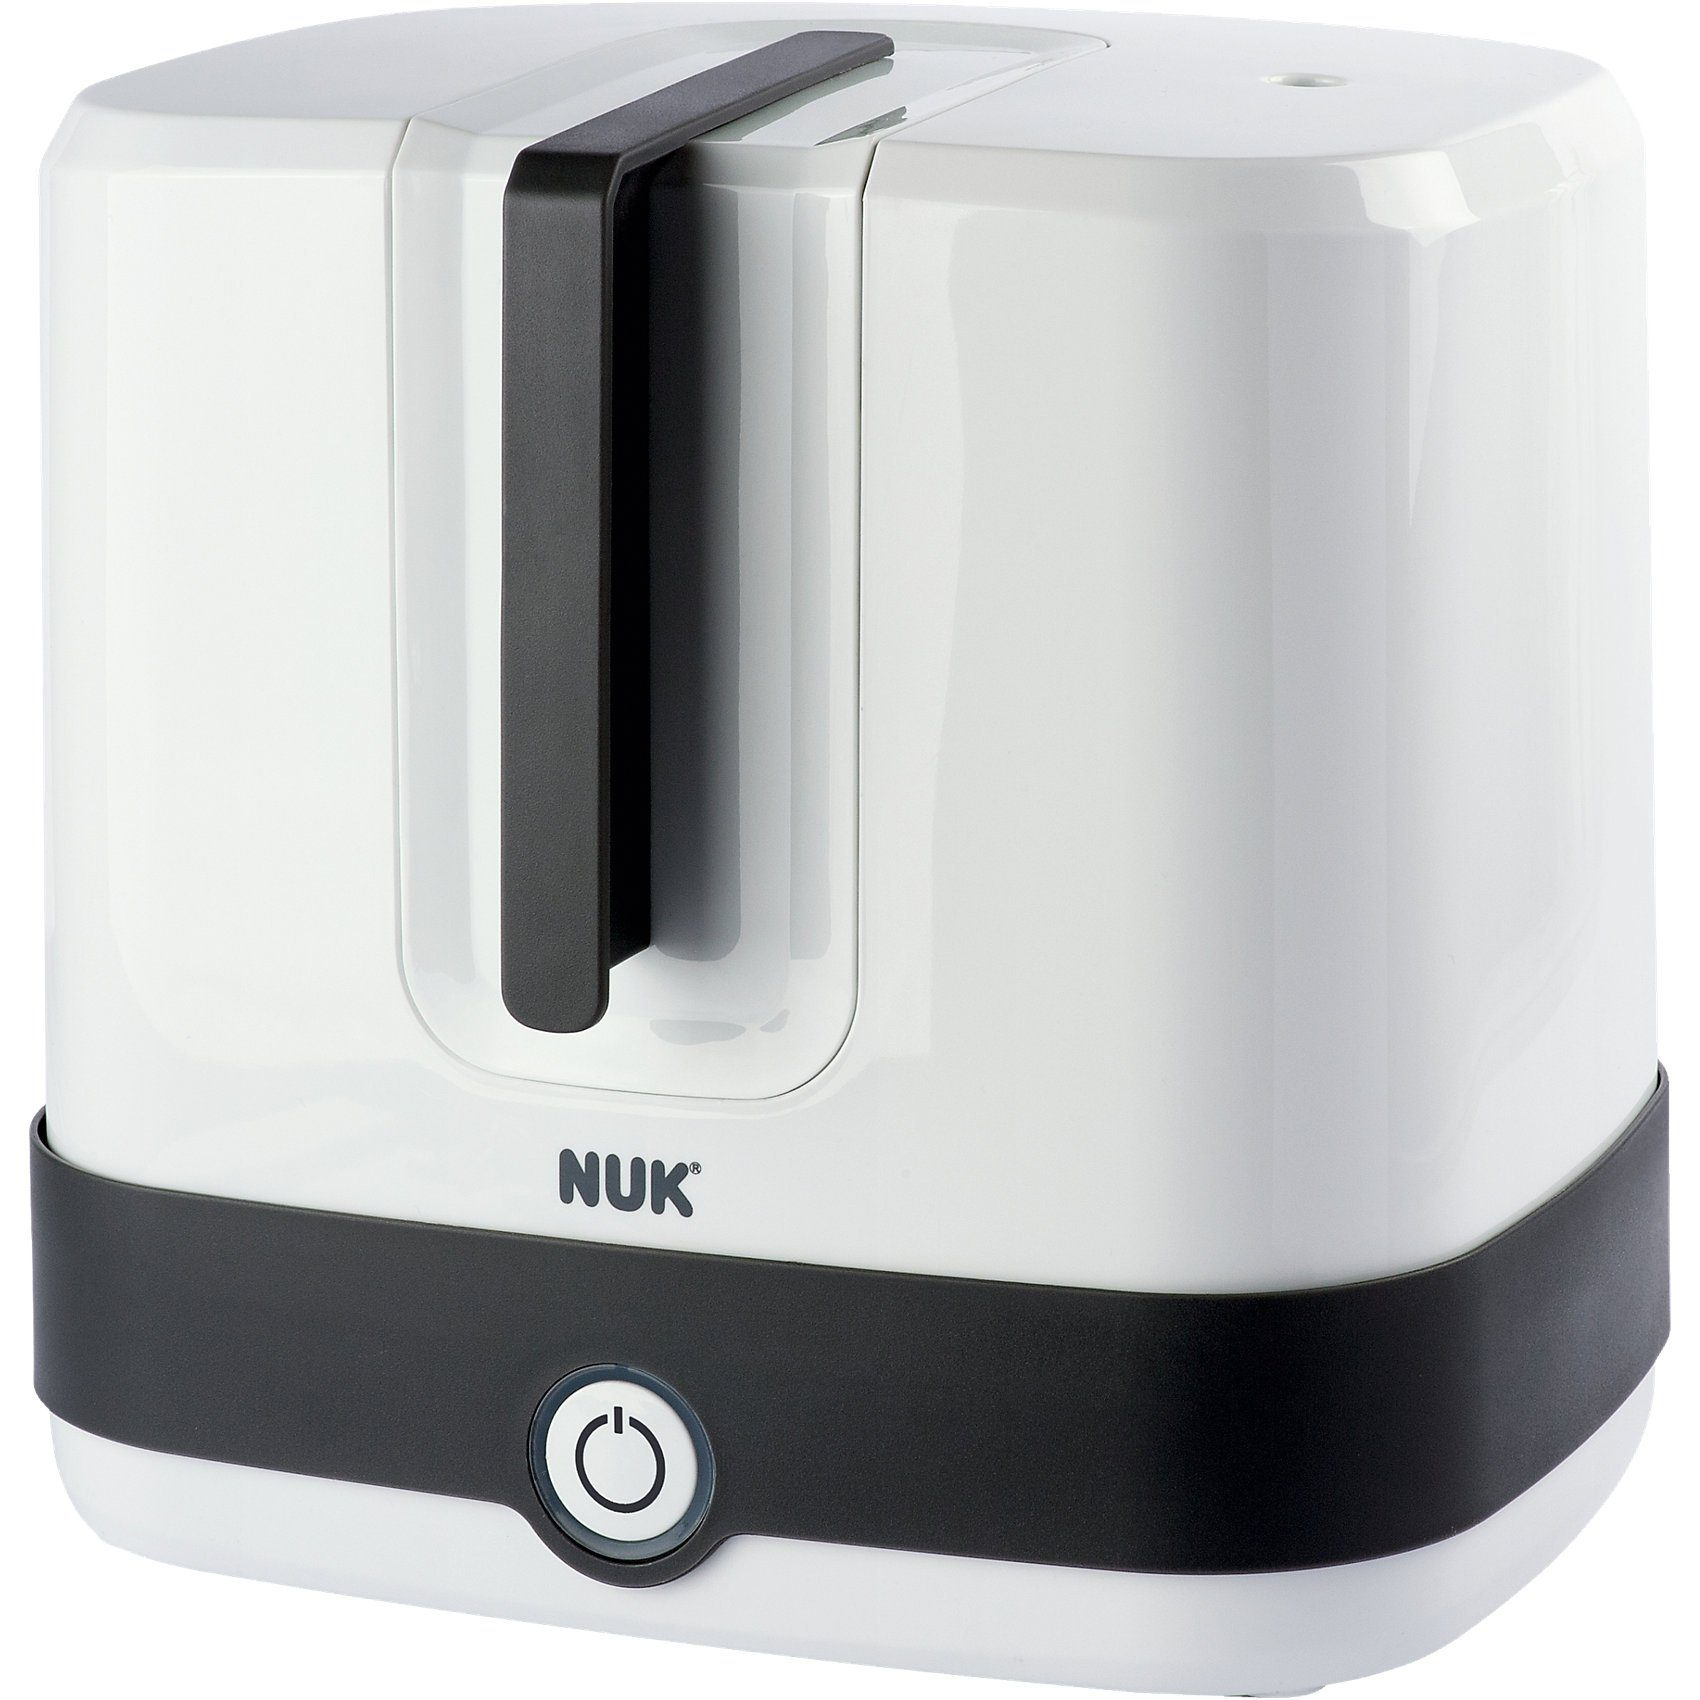 NUK Dampfsterilisator Vario Express